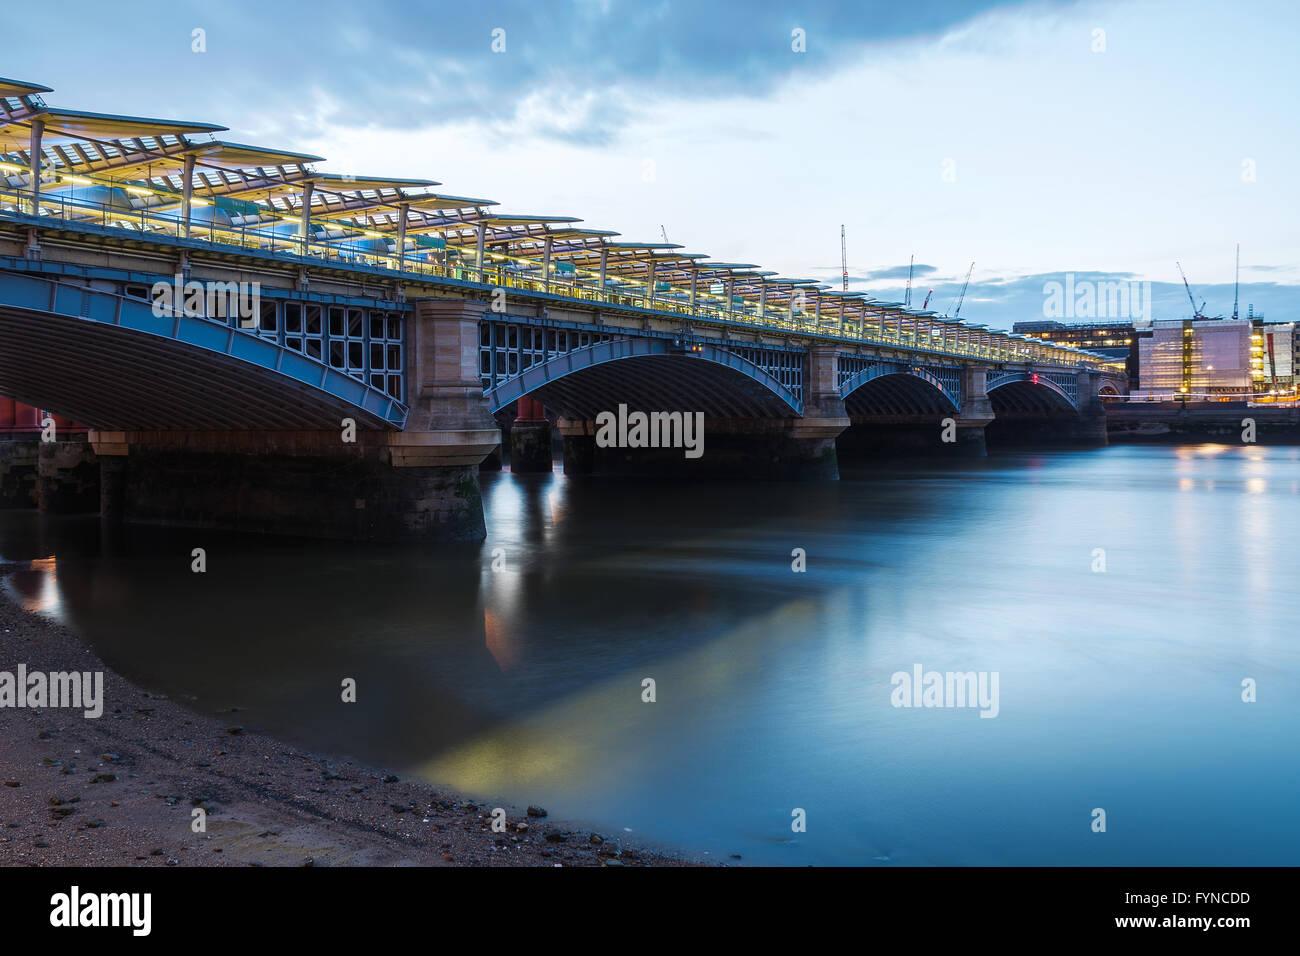 London Blackfriars national rail bridge, station to have platforms that span the river Thames. - Stock Image